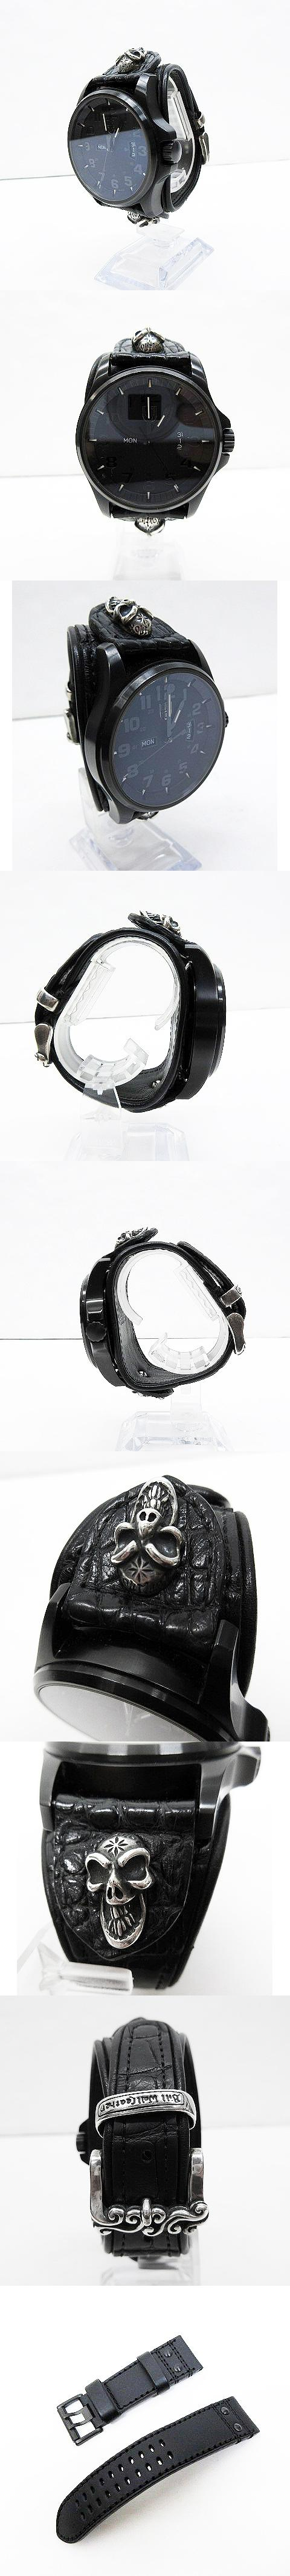 × LUMINOX ルミノックス コラボレーション  限定 1870 スカル シルバー フィールドタイムデイト アリゲーター クォーツ 腕時計